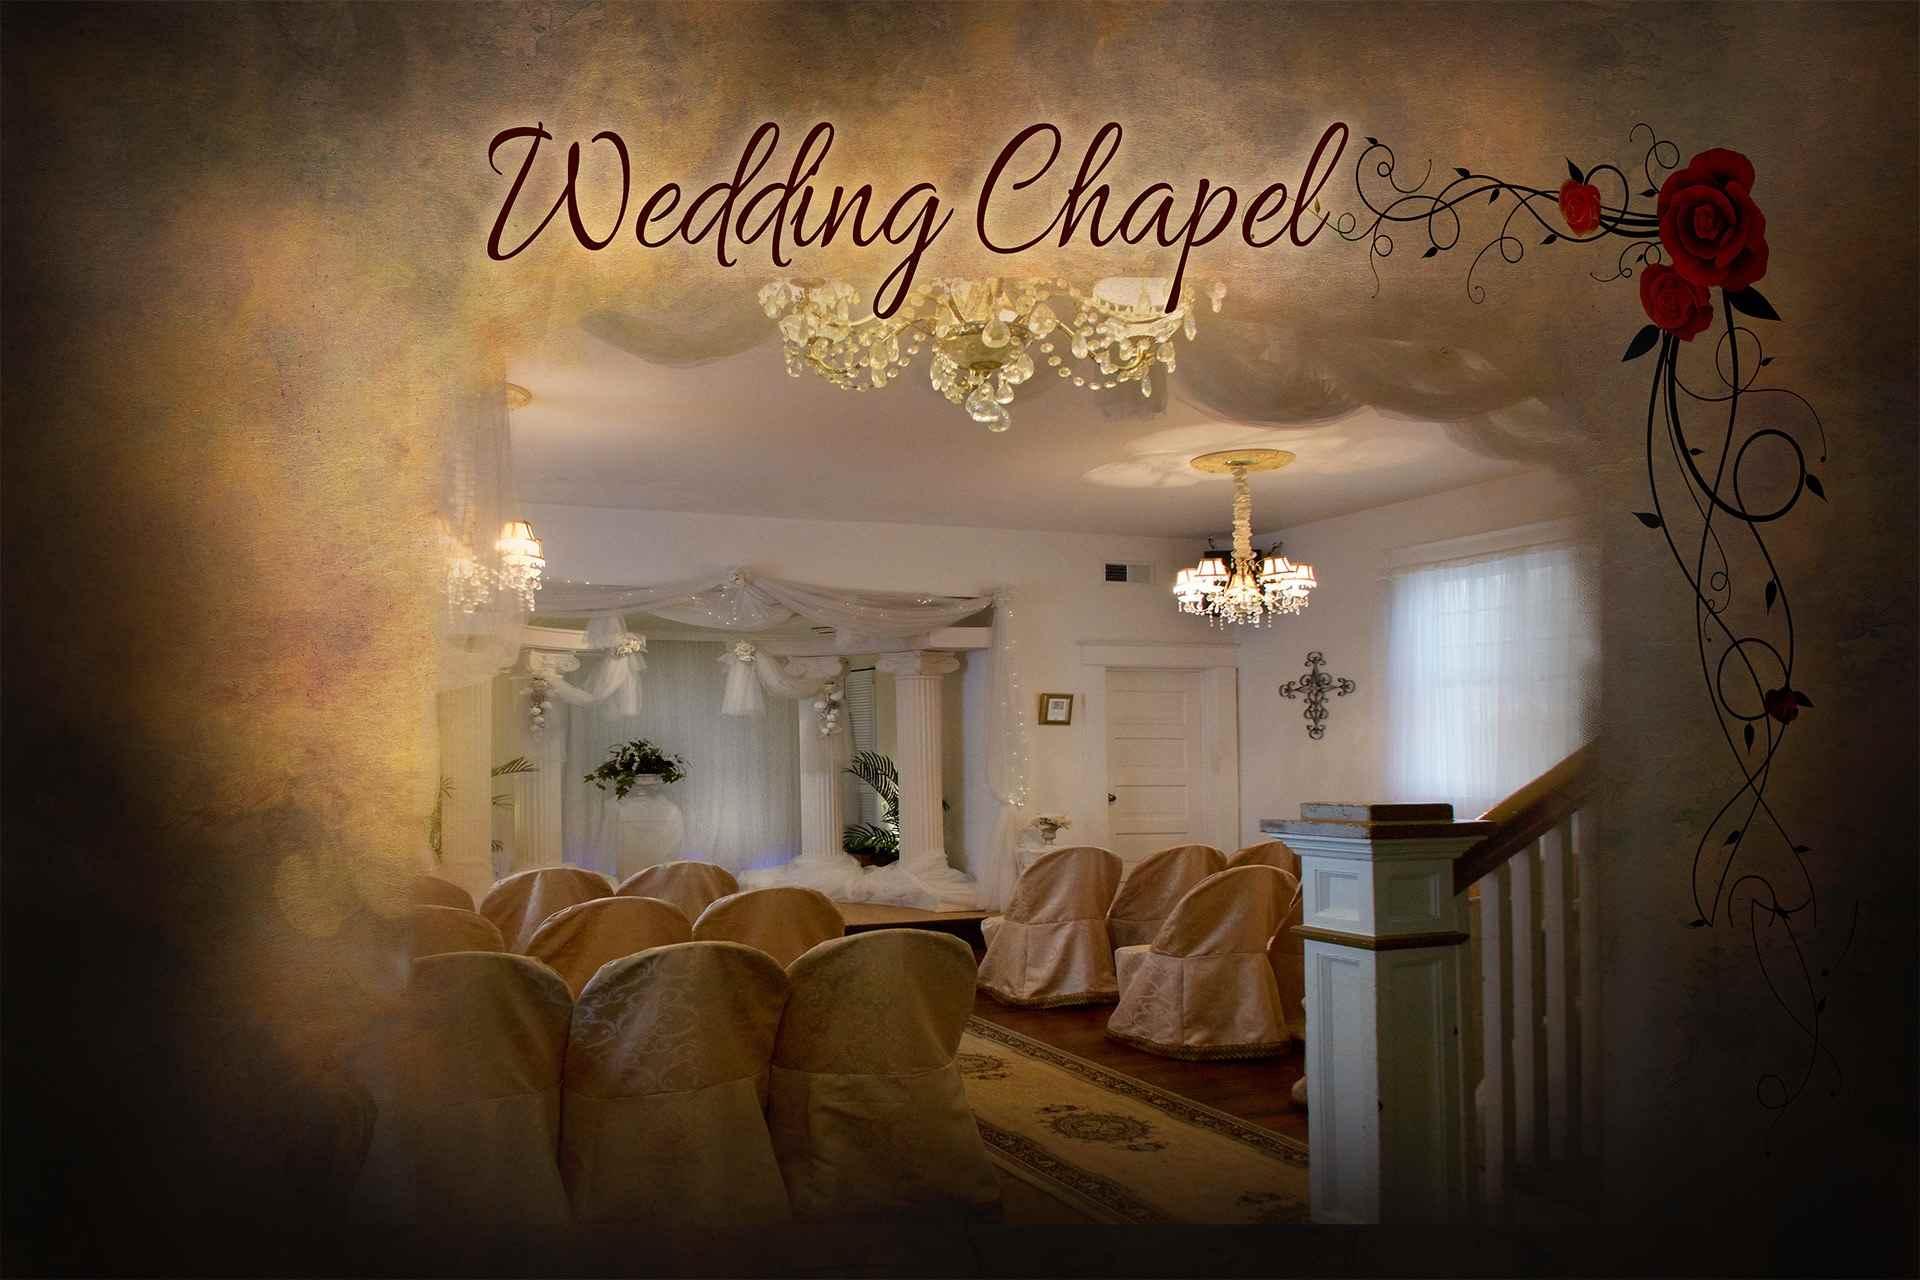 Strange Wedding Chapel Galveston Texas Download Free Architecture Designs Intelgarnamadebymaigaardcom